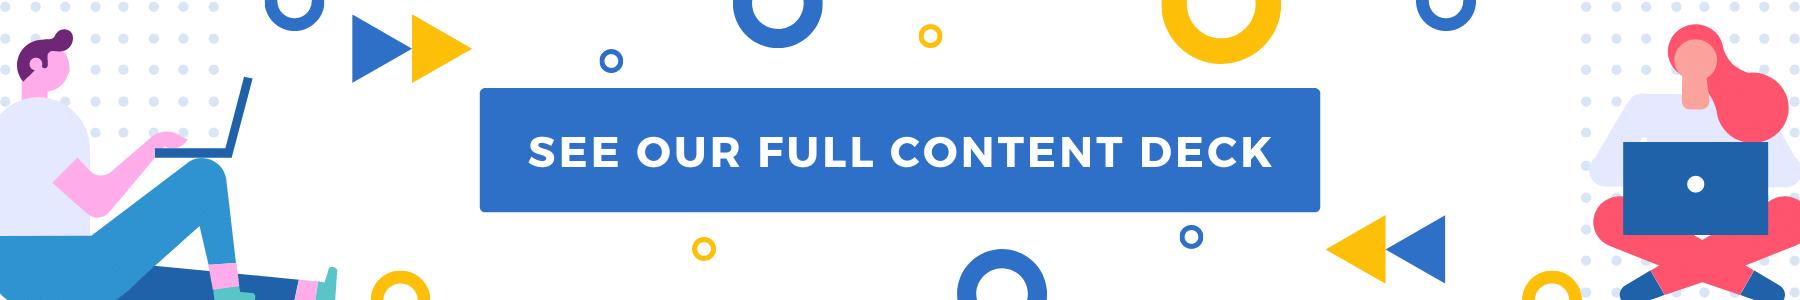 content deck Sociallyin 2021